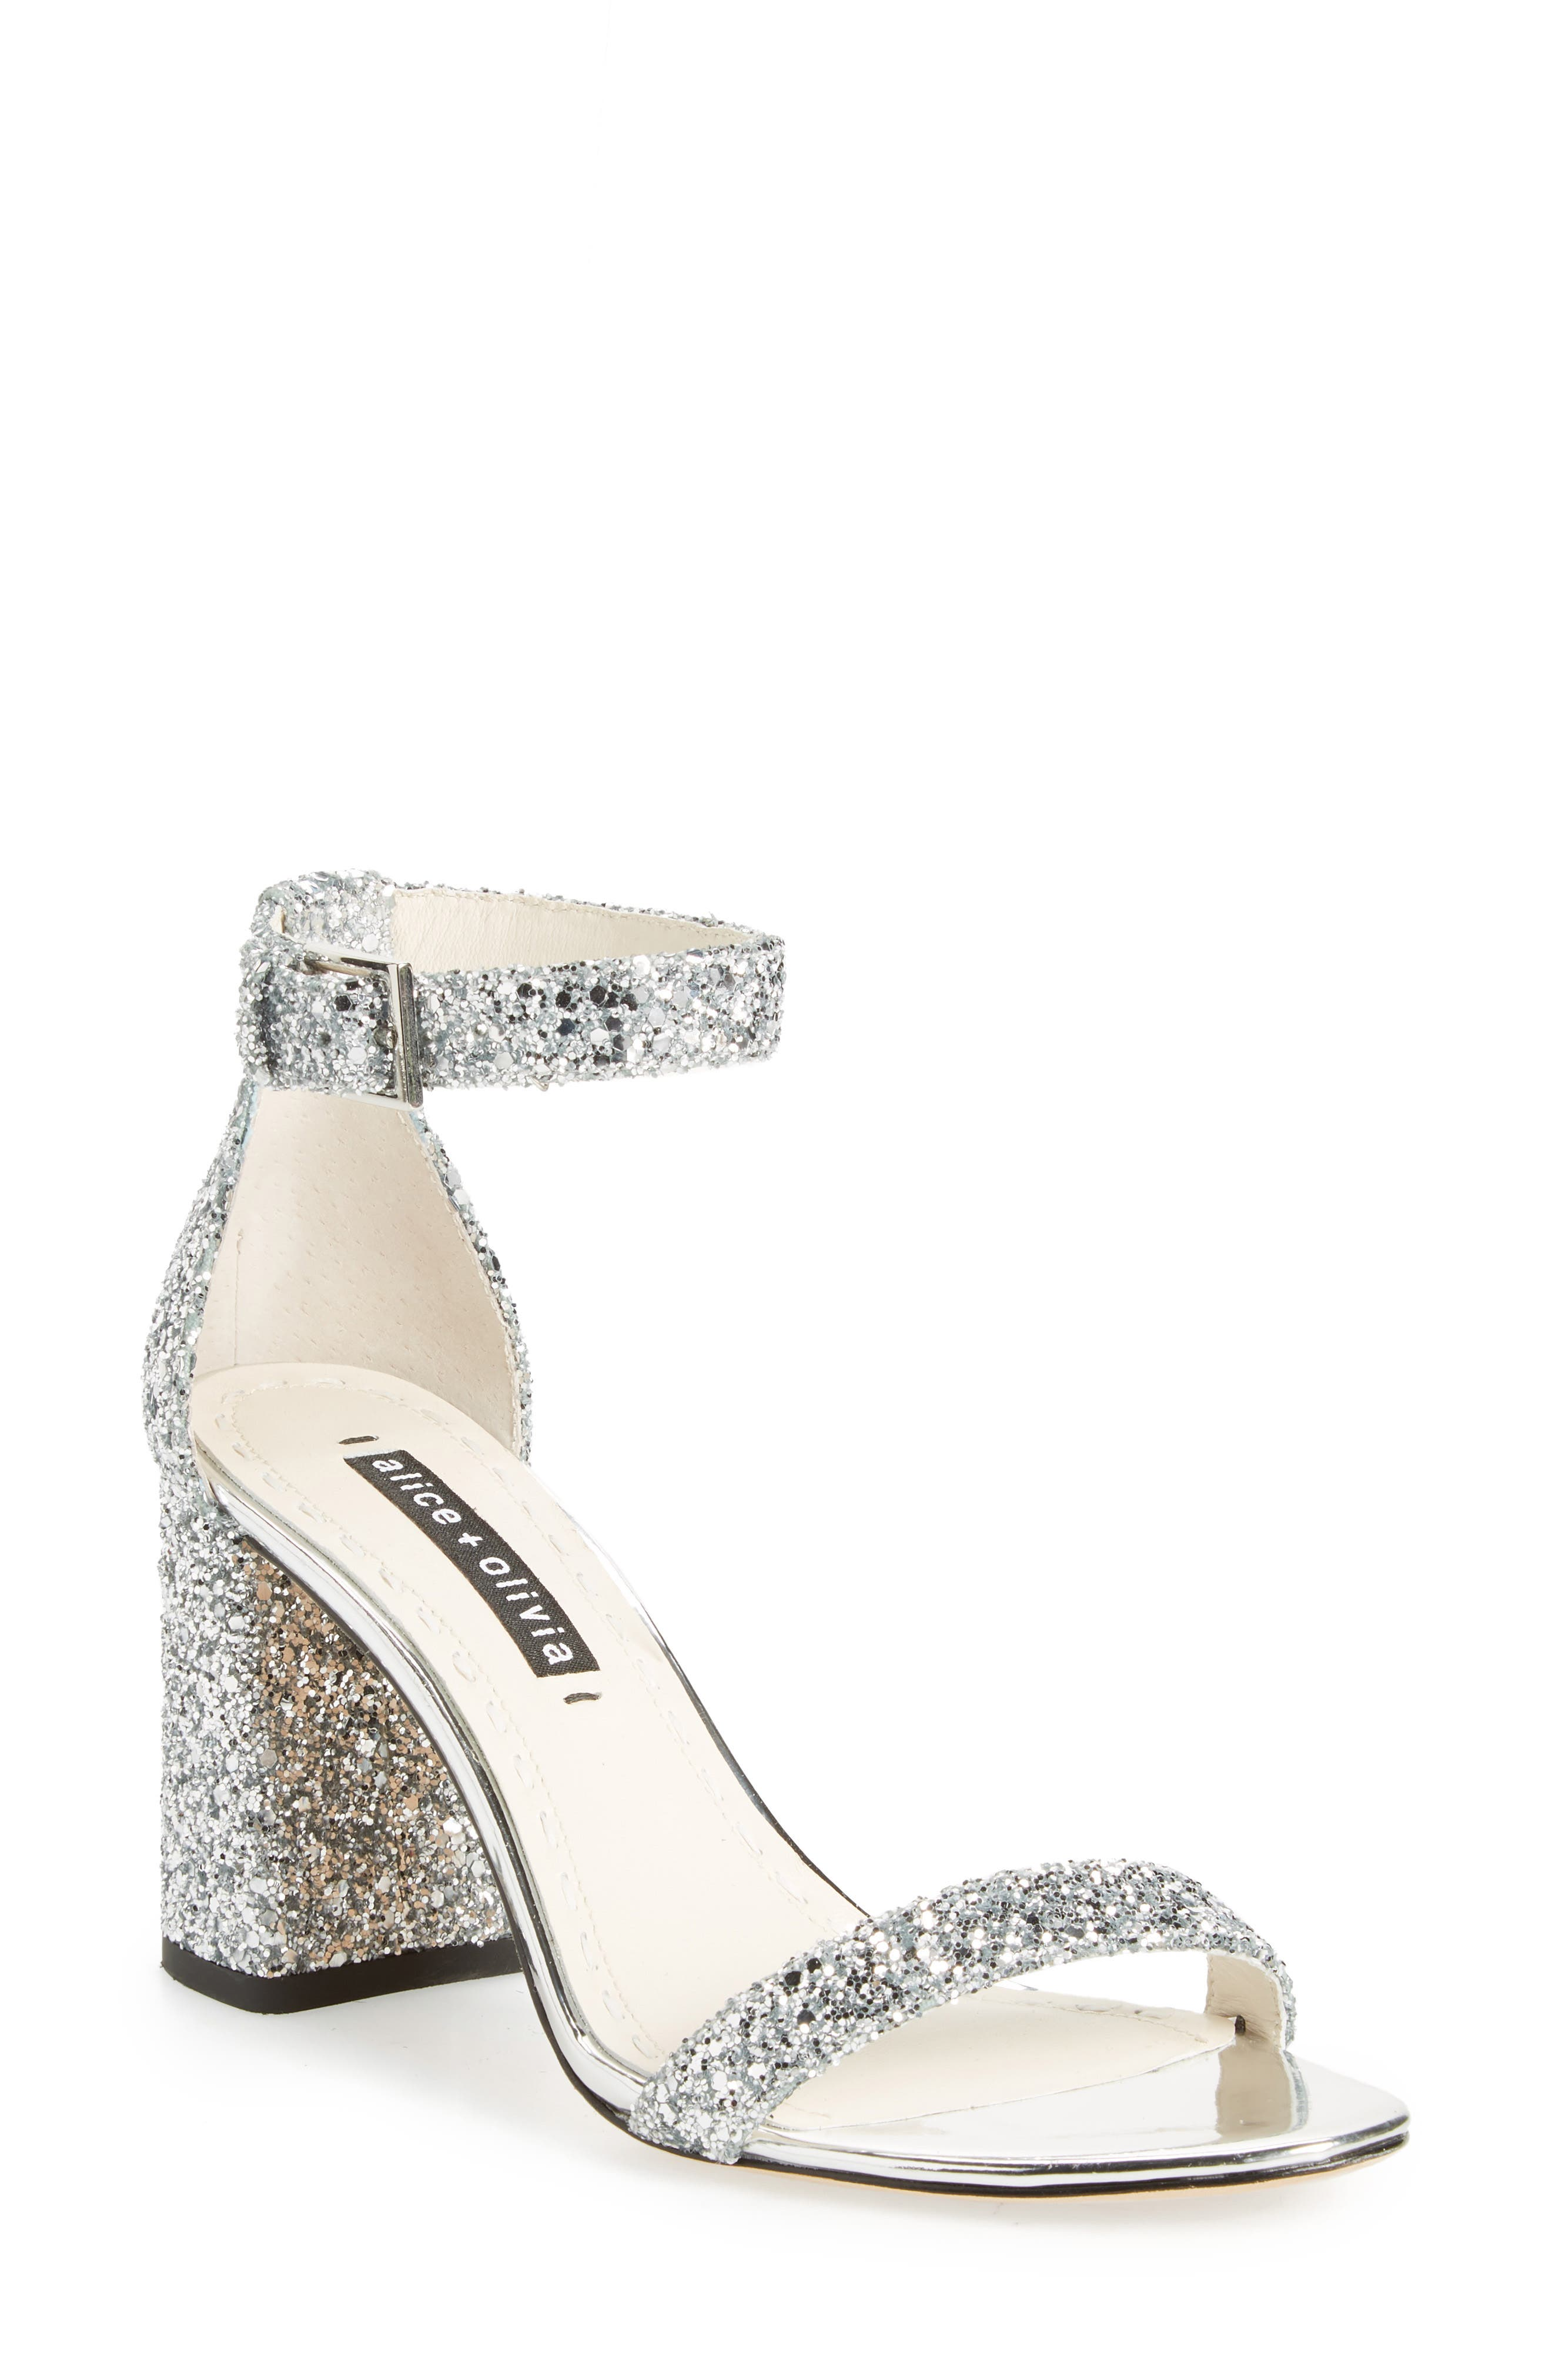 Lillian Glitter Ankle Strap Sandal,                             Main thumbnail 1, color,                             020